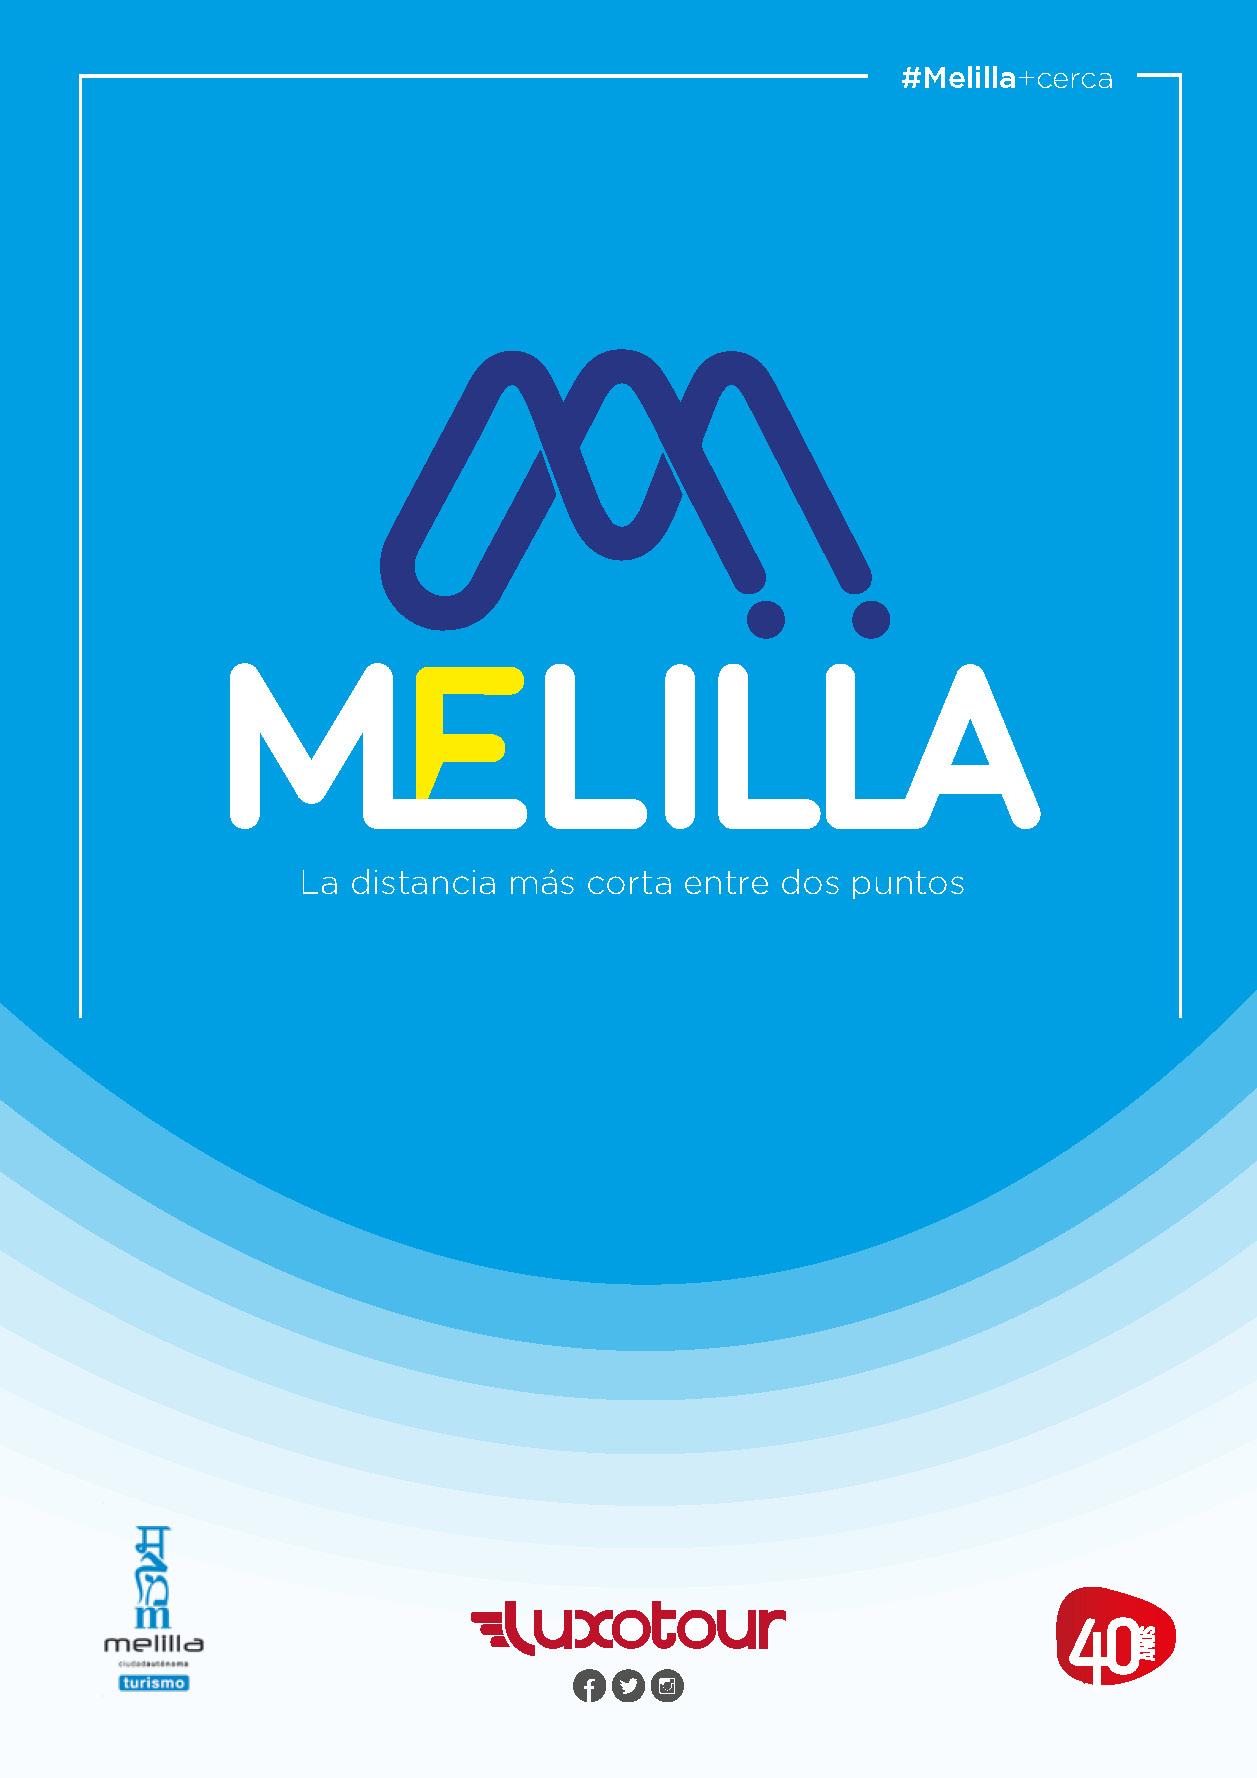 Catalogo Luxotour Melilla 2021